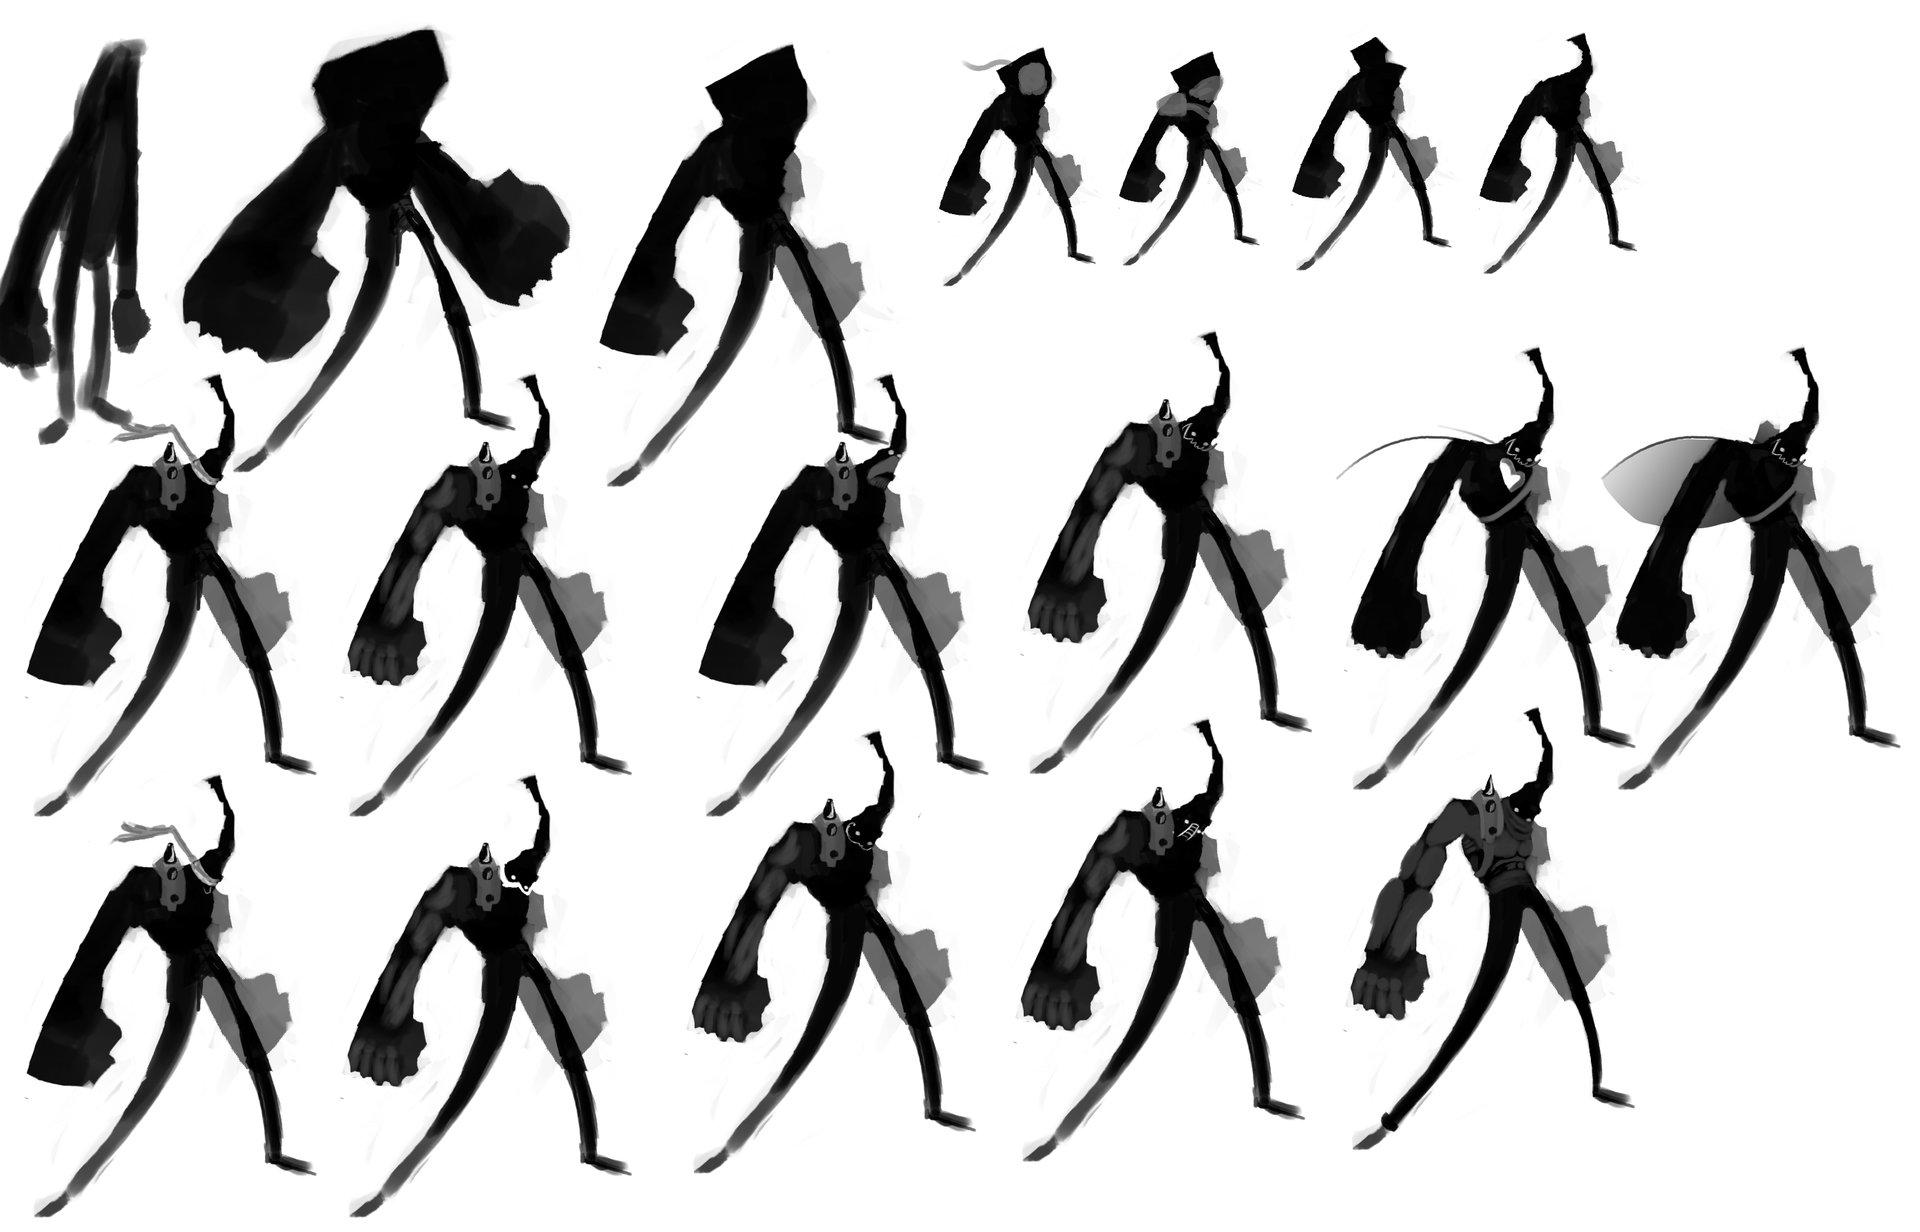 jesse-cutts-boogieideas.jpg?1428524801